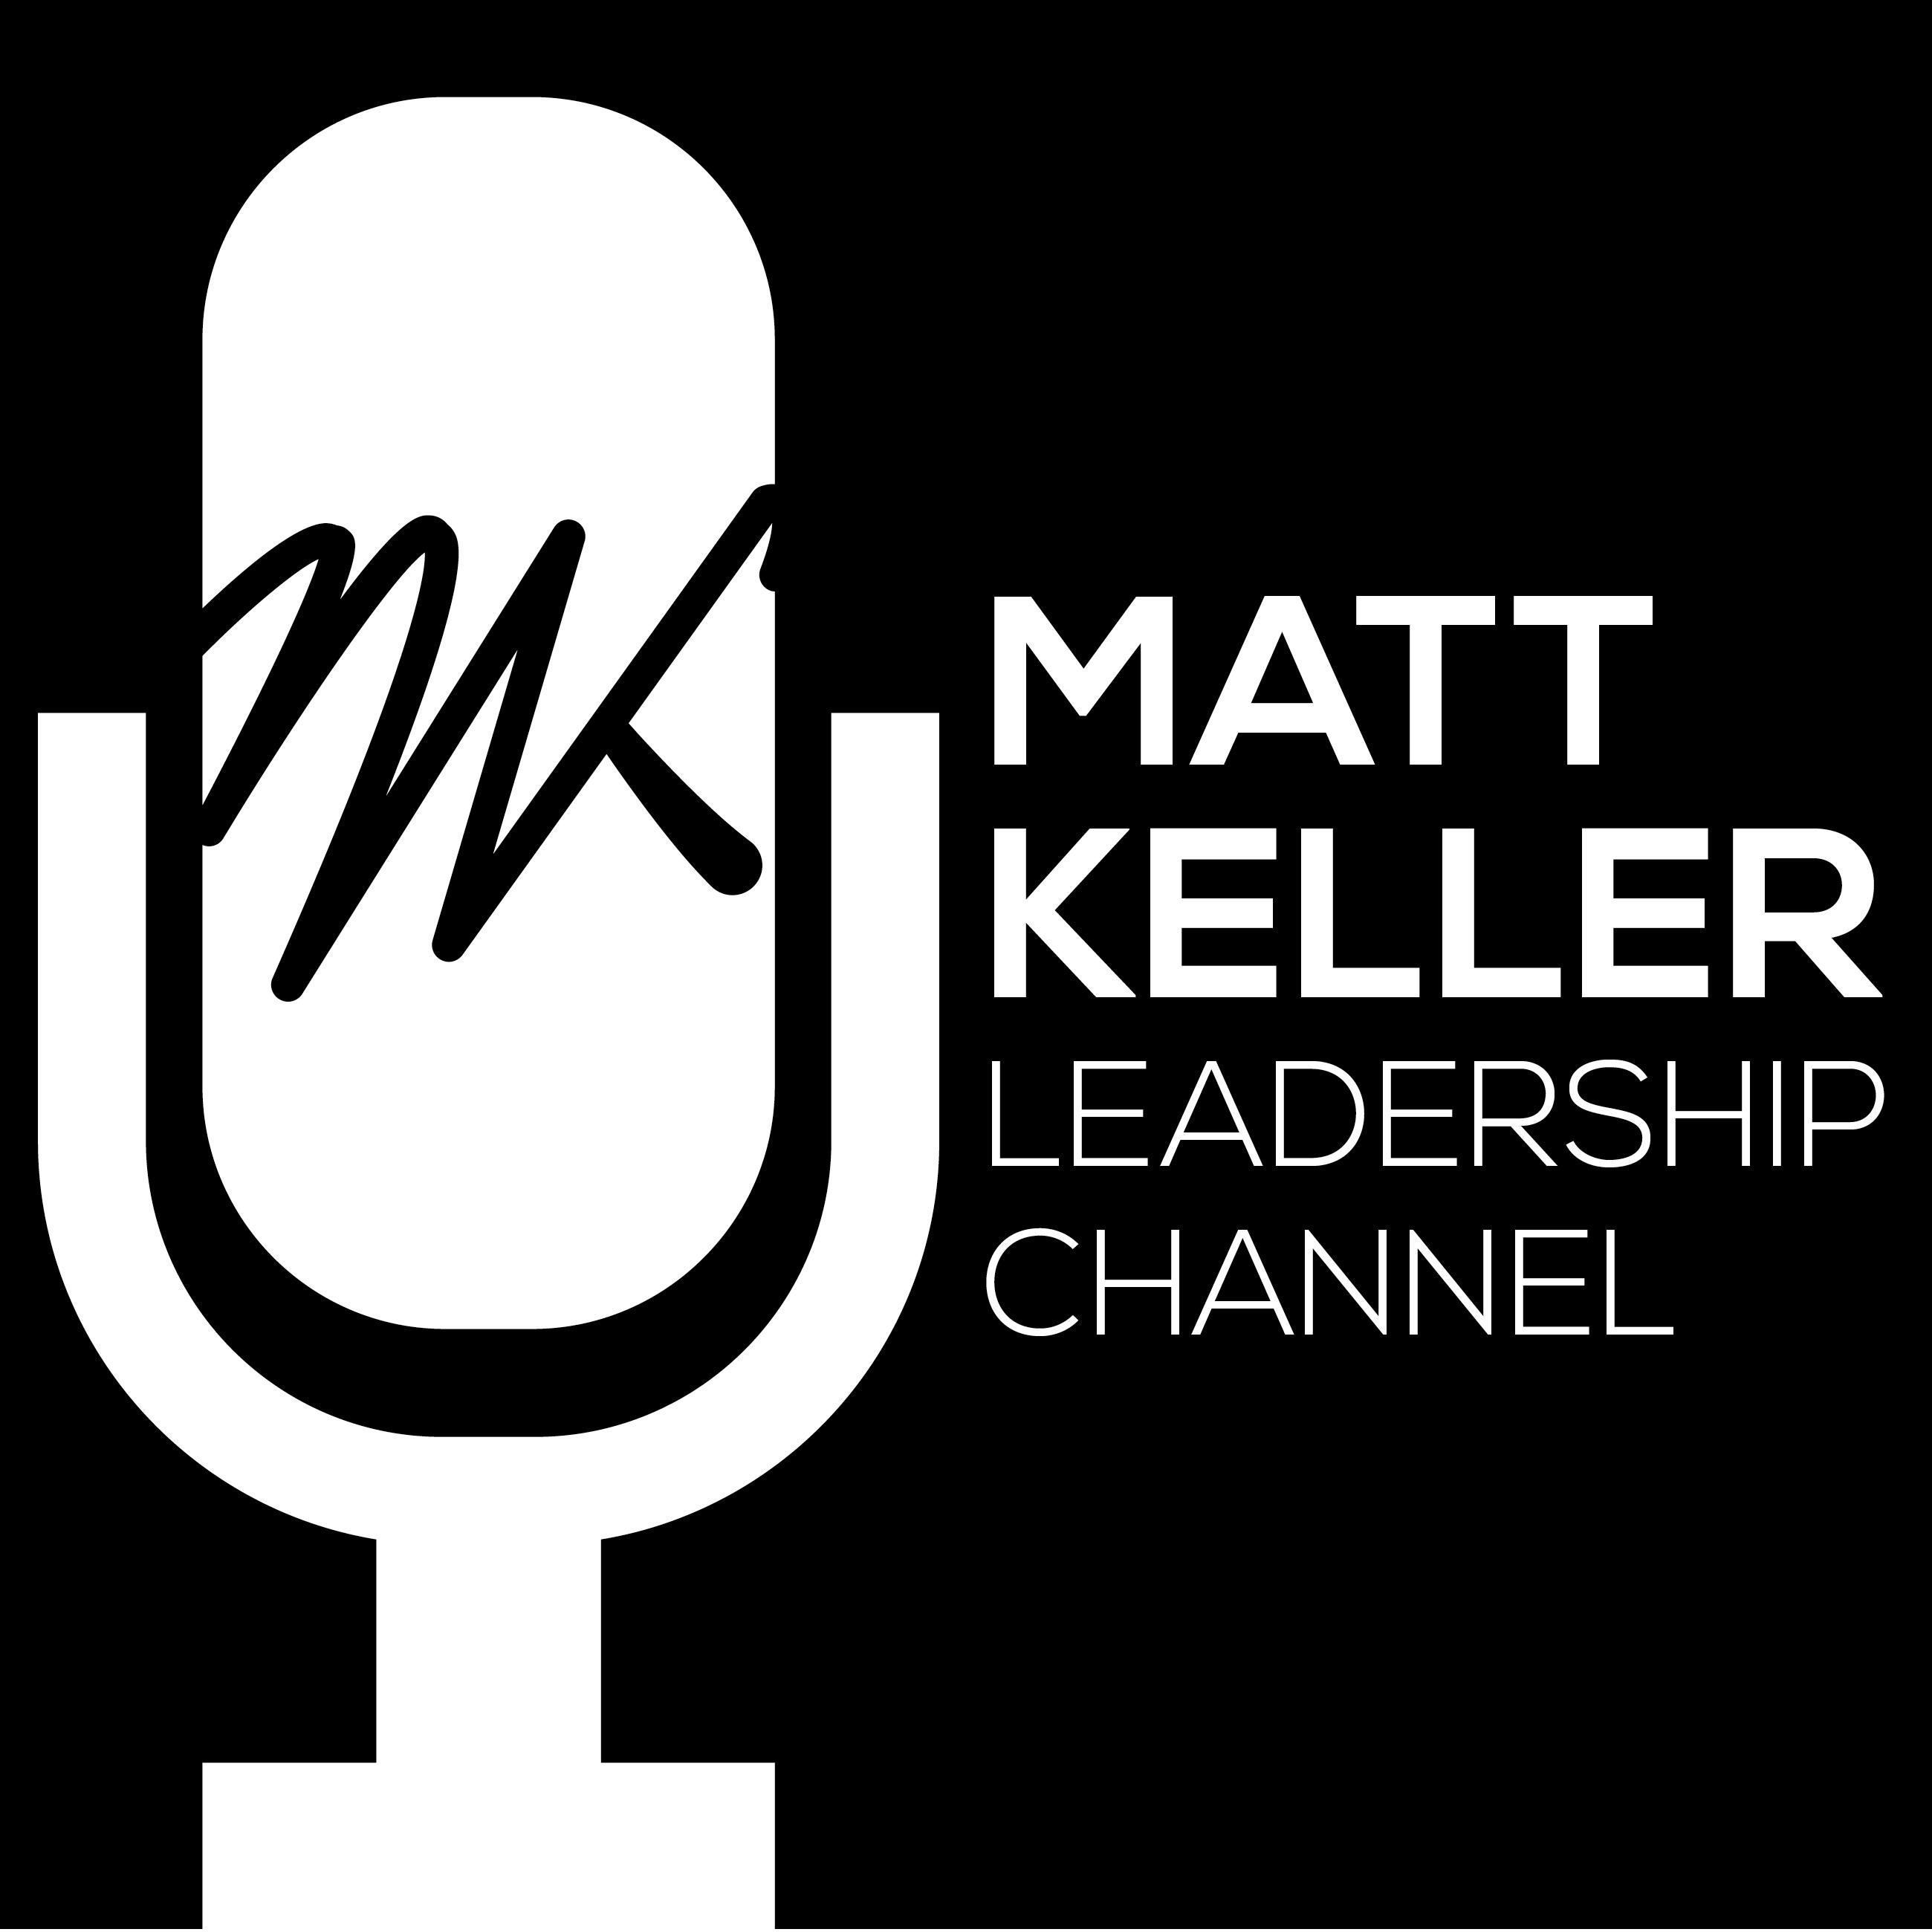 The Matt Keller Leadership Channel